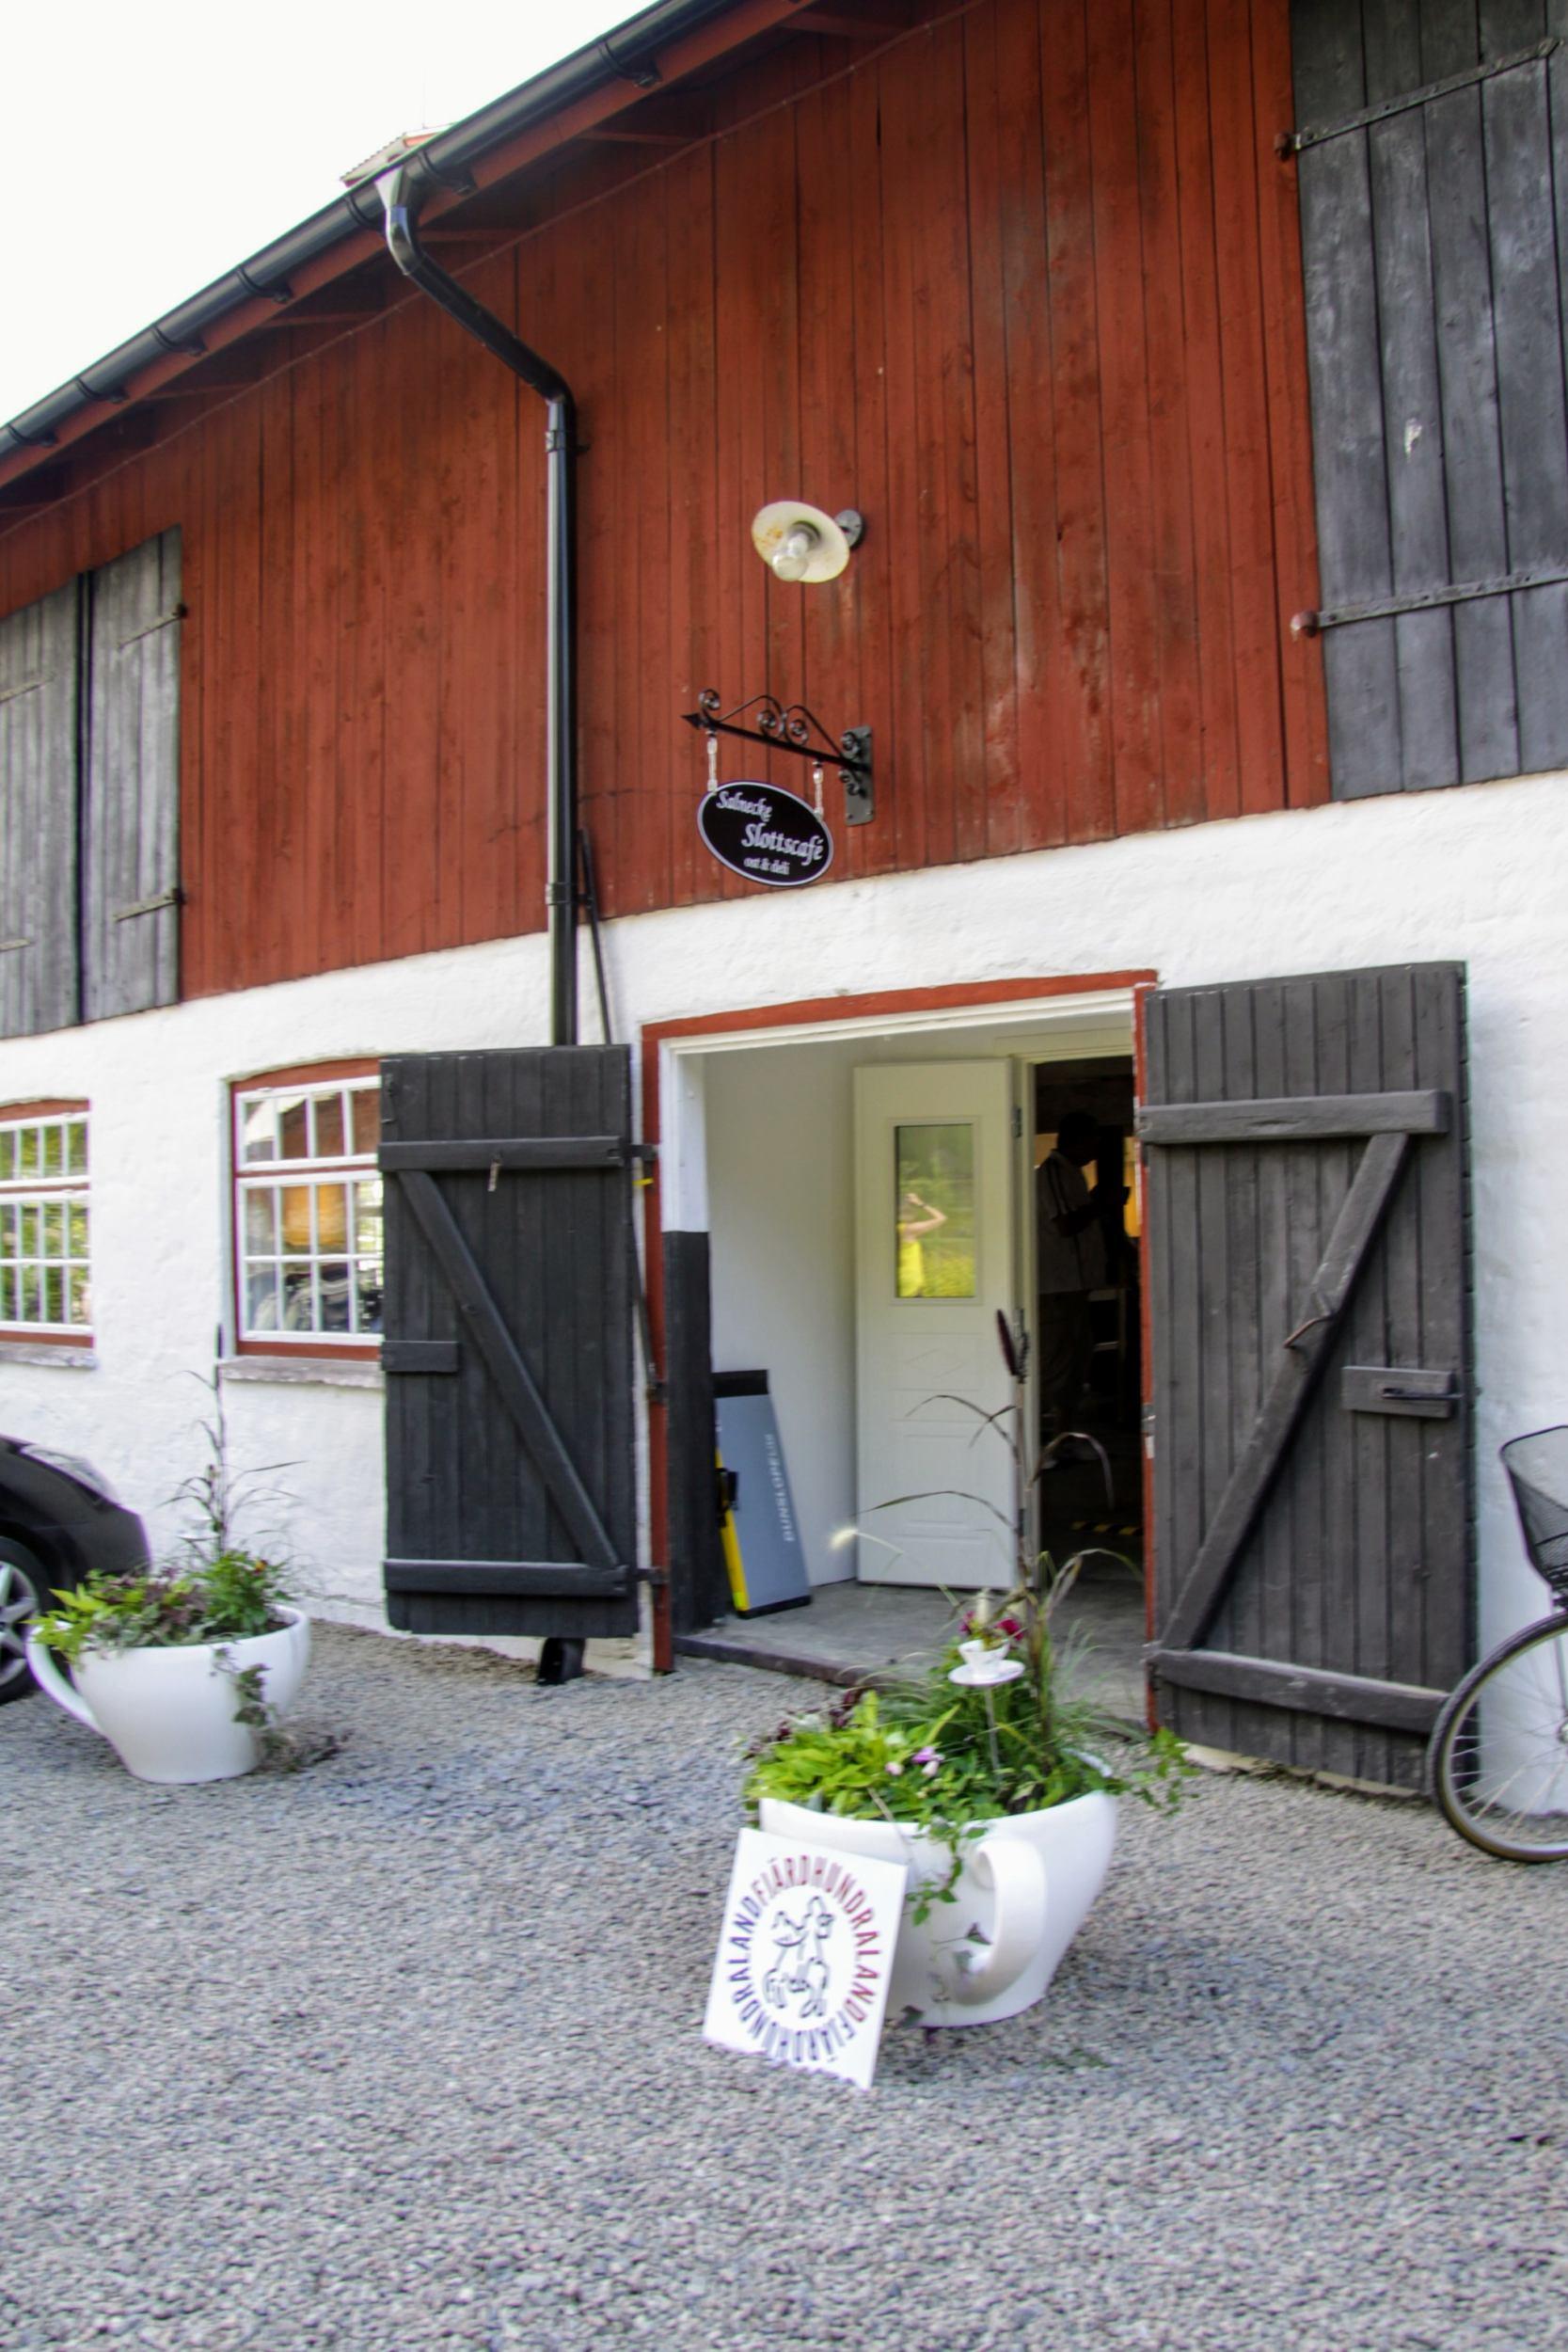 Salnecke castle café entrance